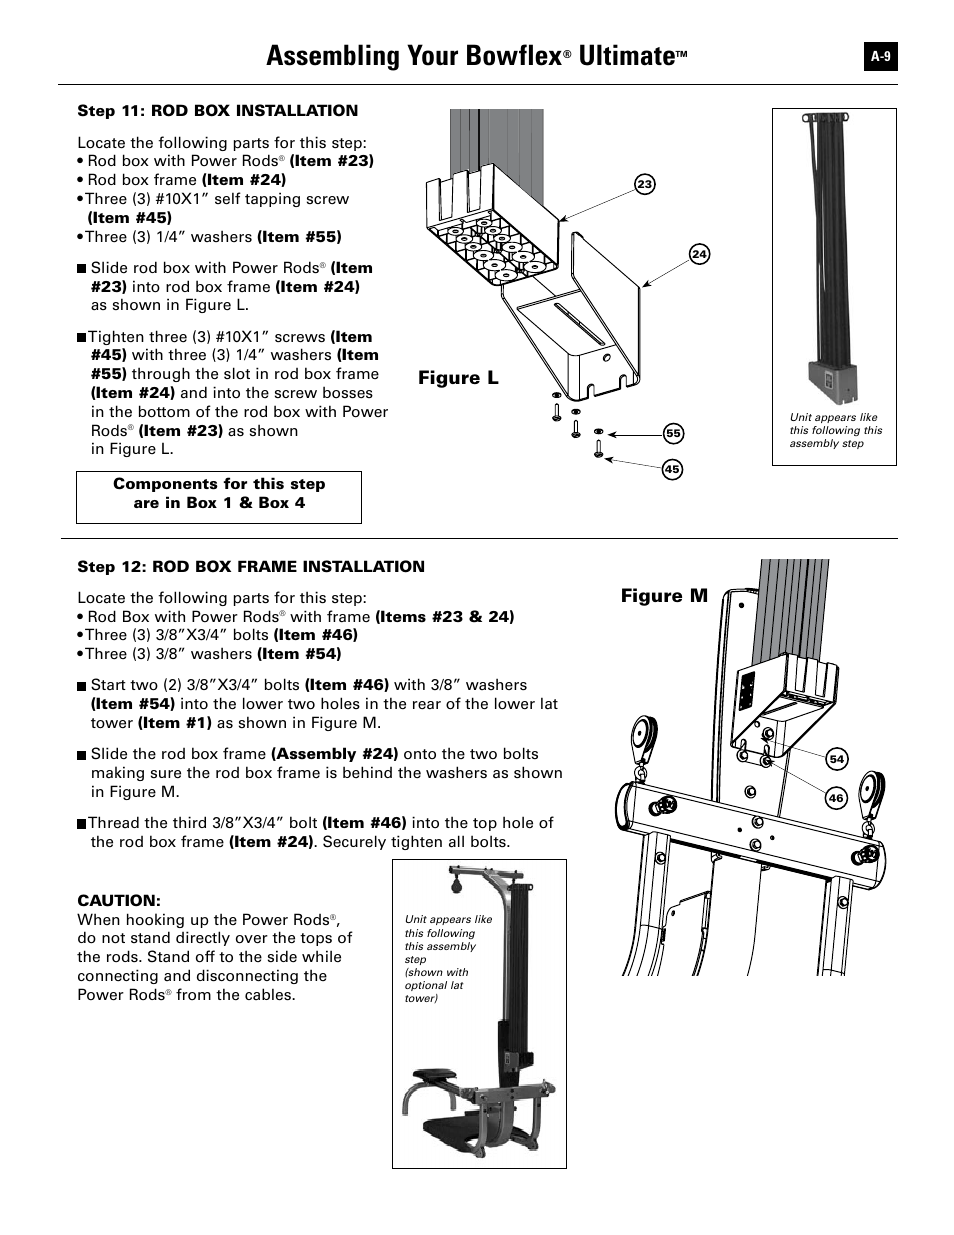 assembling your bowflex ultimate figure l bowflex ultimate user rh manualsdir com Bowflex Adjustable Dumbbells Bowflex SelectTech Adjustable Bench Series 3 1